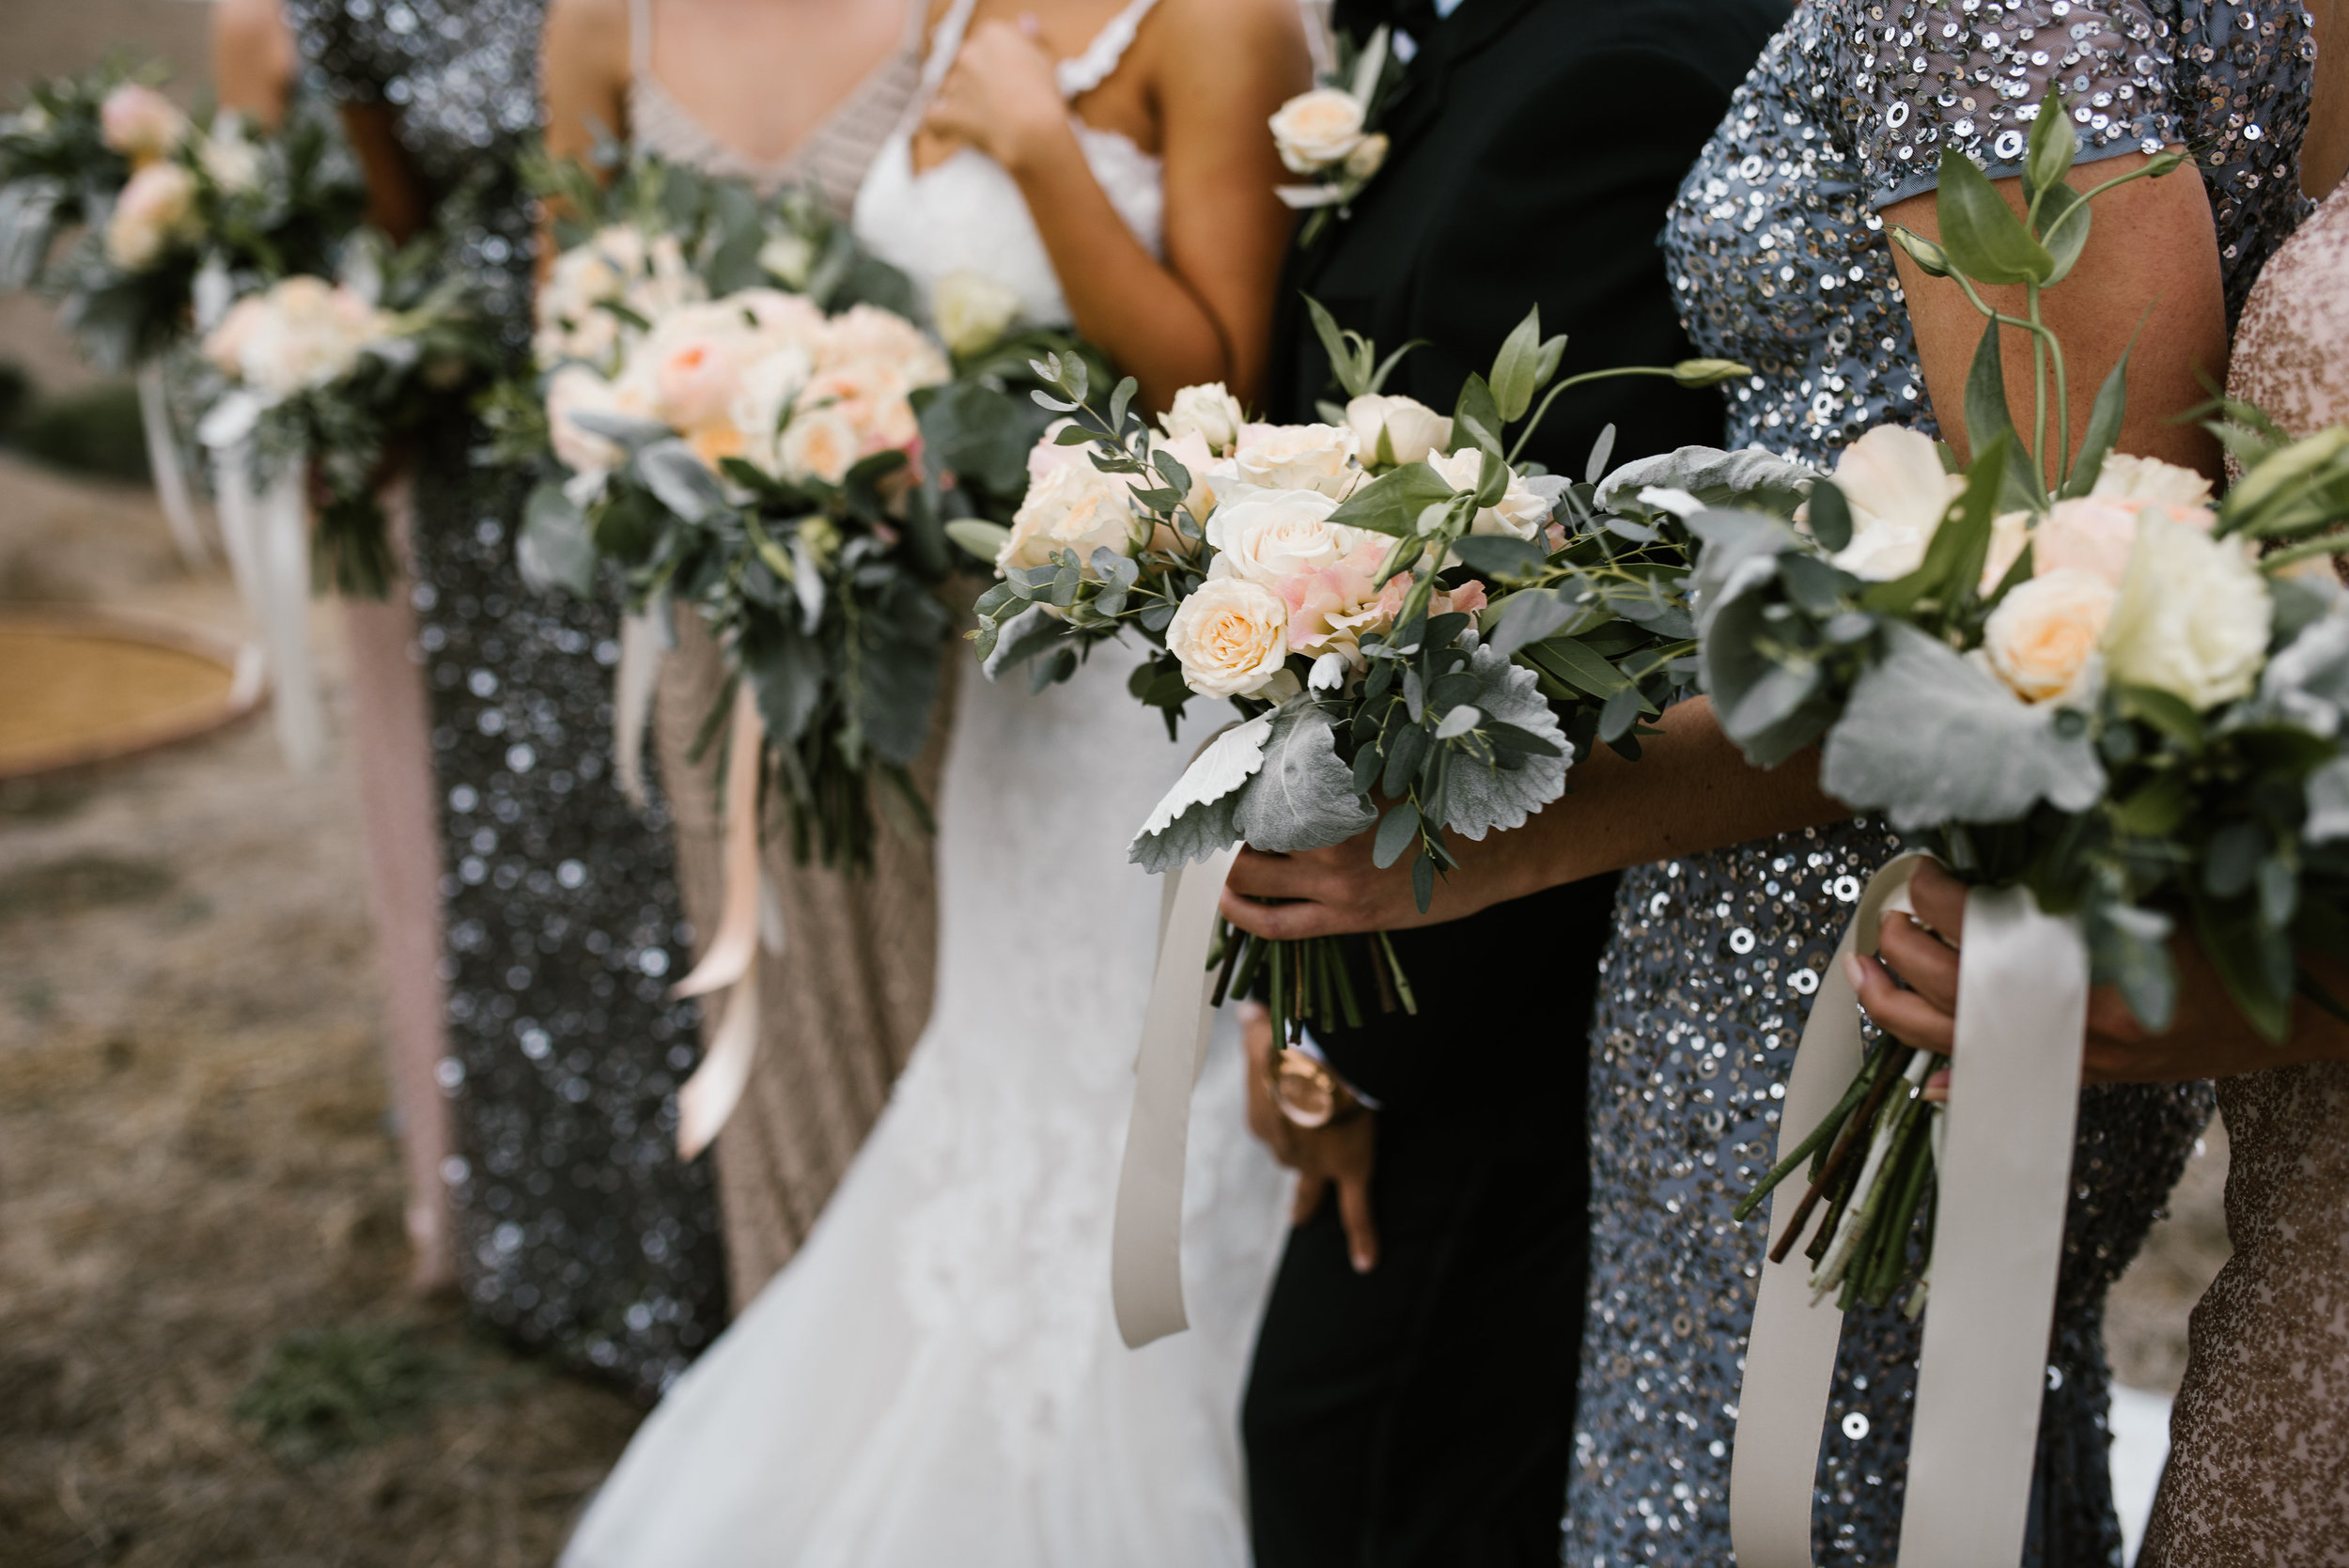 Rachel-Michael-Diaz-Wedding-194.jpg